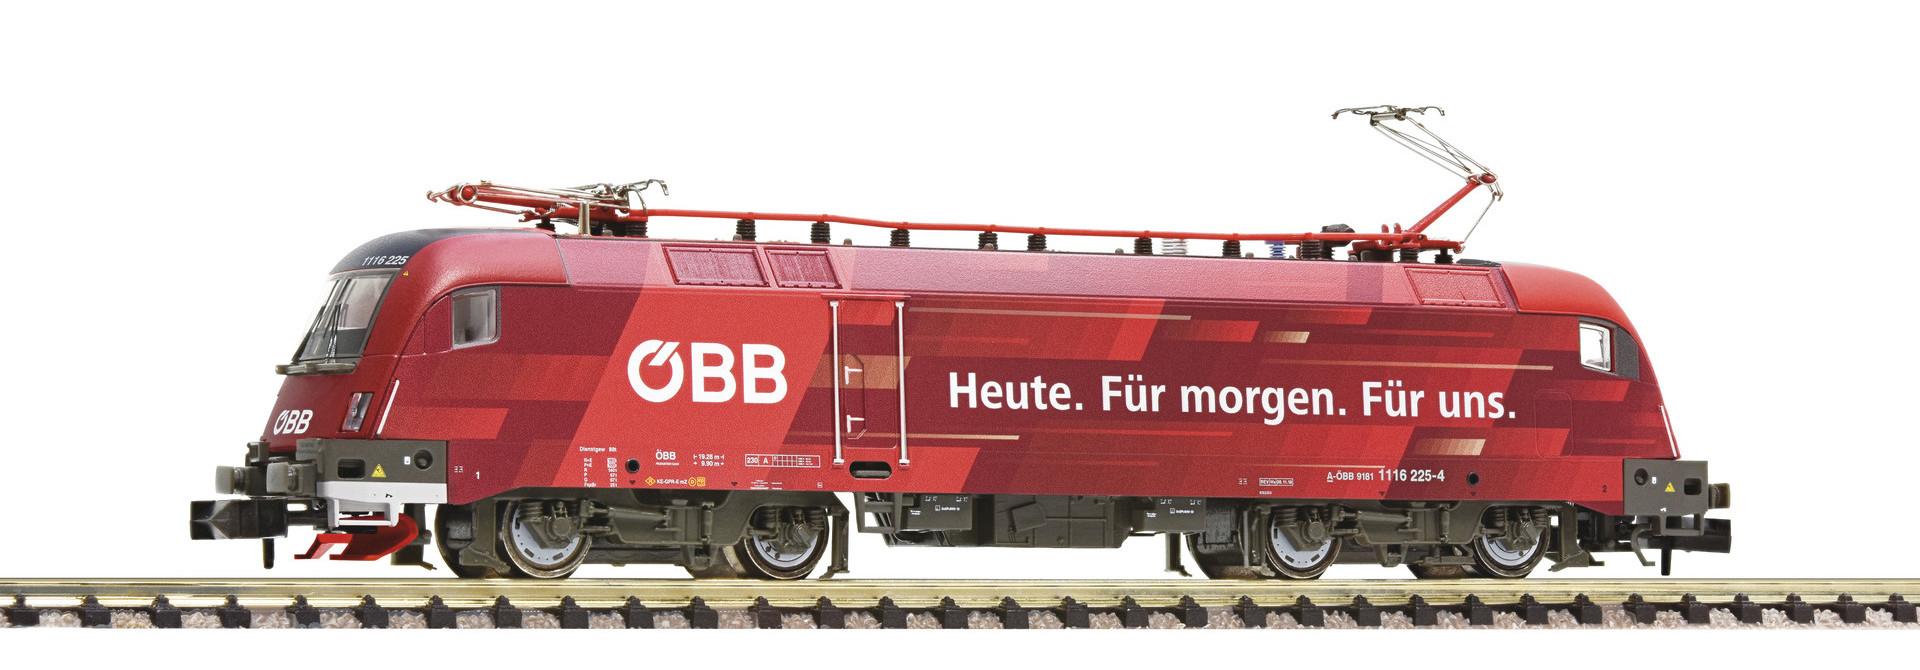 "781773 E-Lok 1116 225-4 SND.""Heute ..."